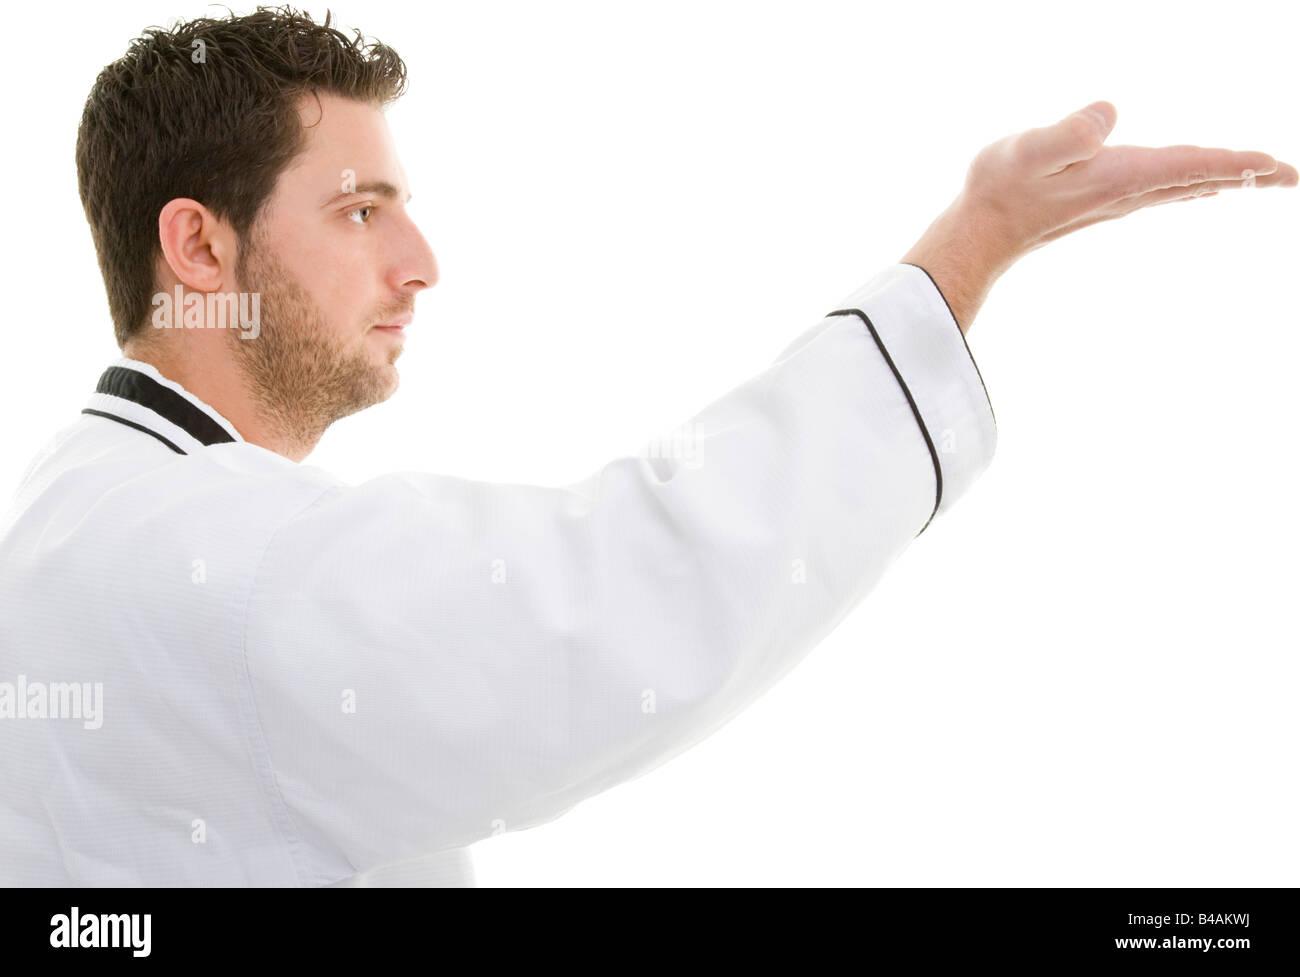 man make taekwondo - Stock Image